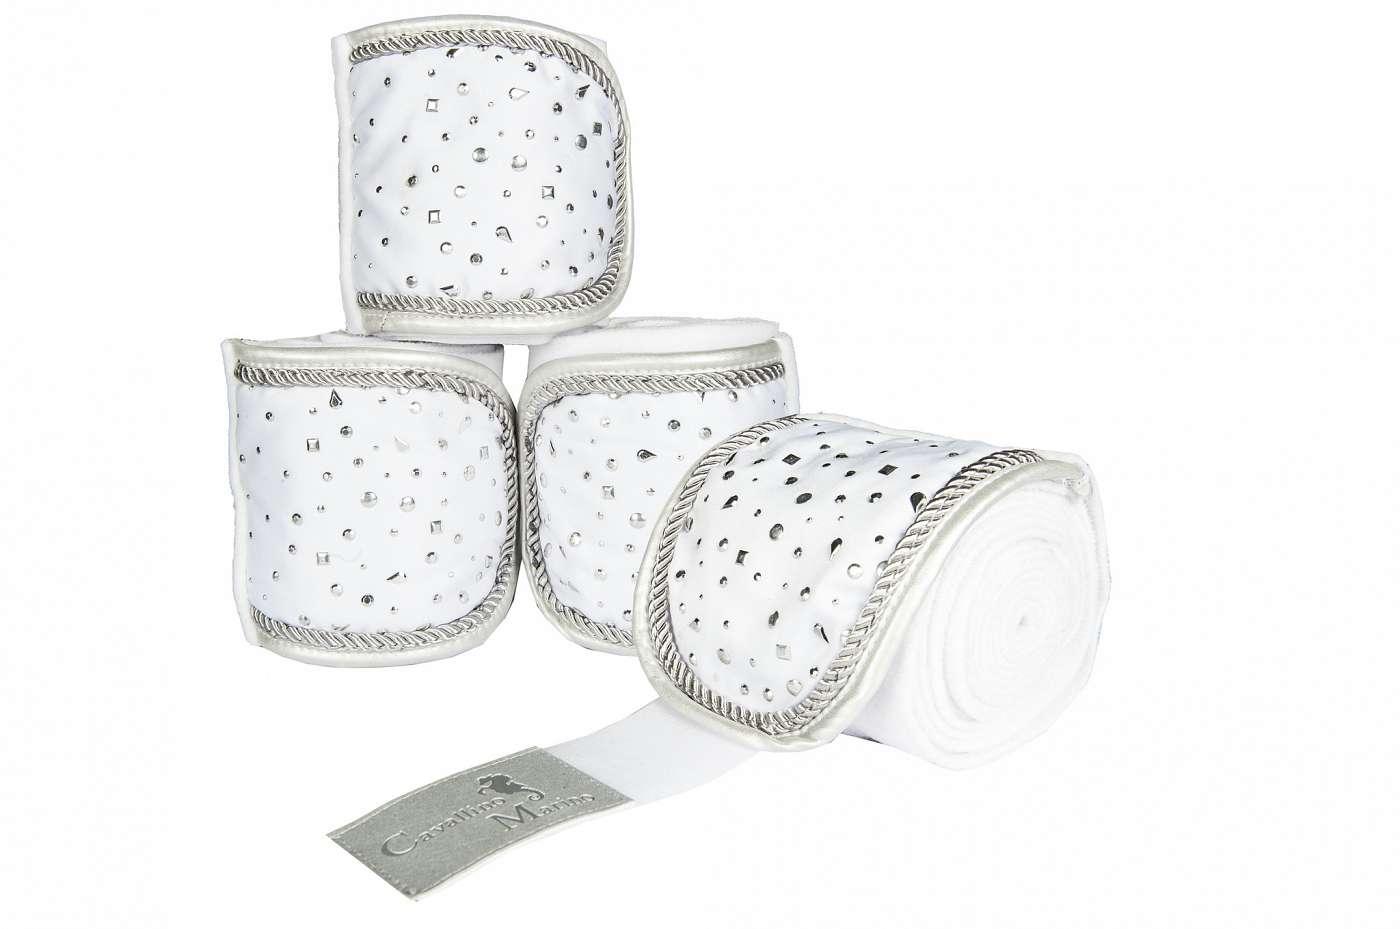 HKM_Cavallino_Marino_Silver_Stream_Polar_Fleece_Bandages